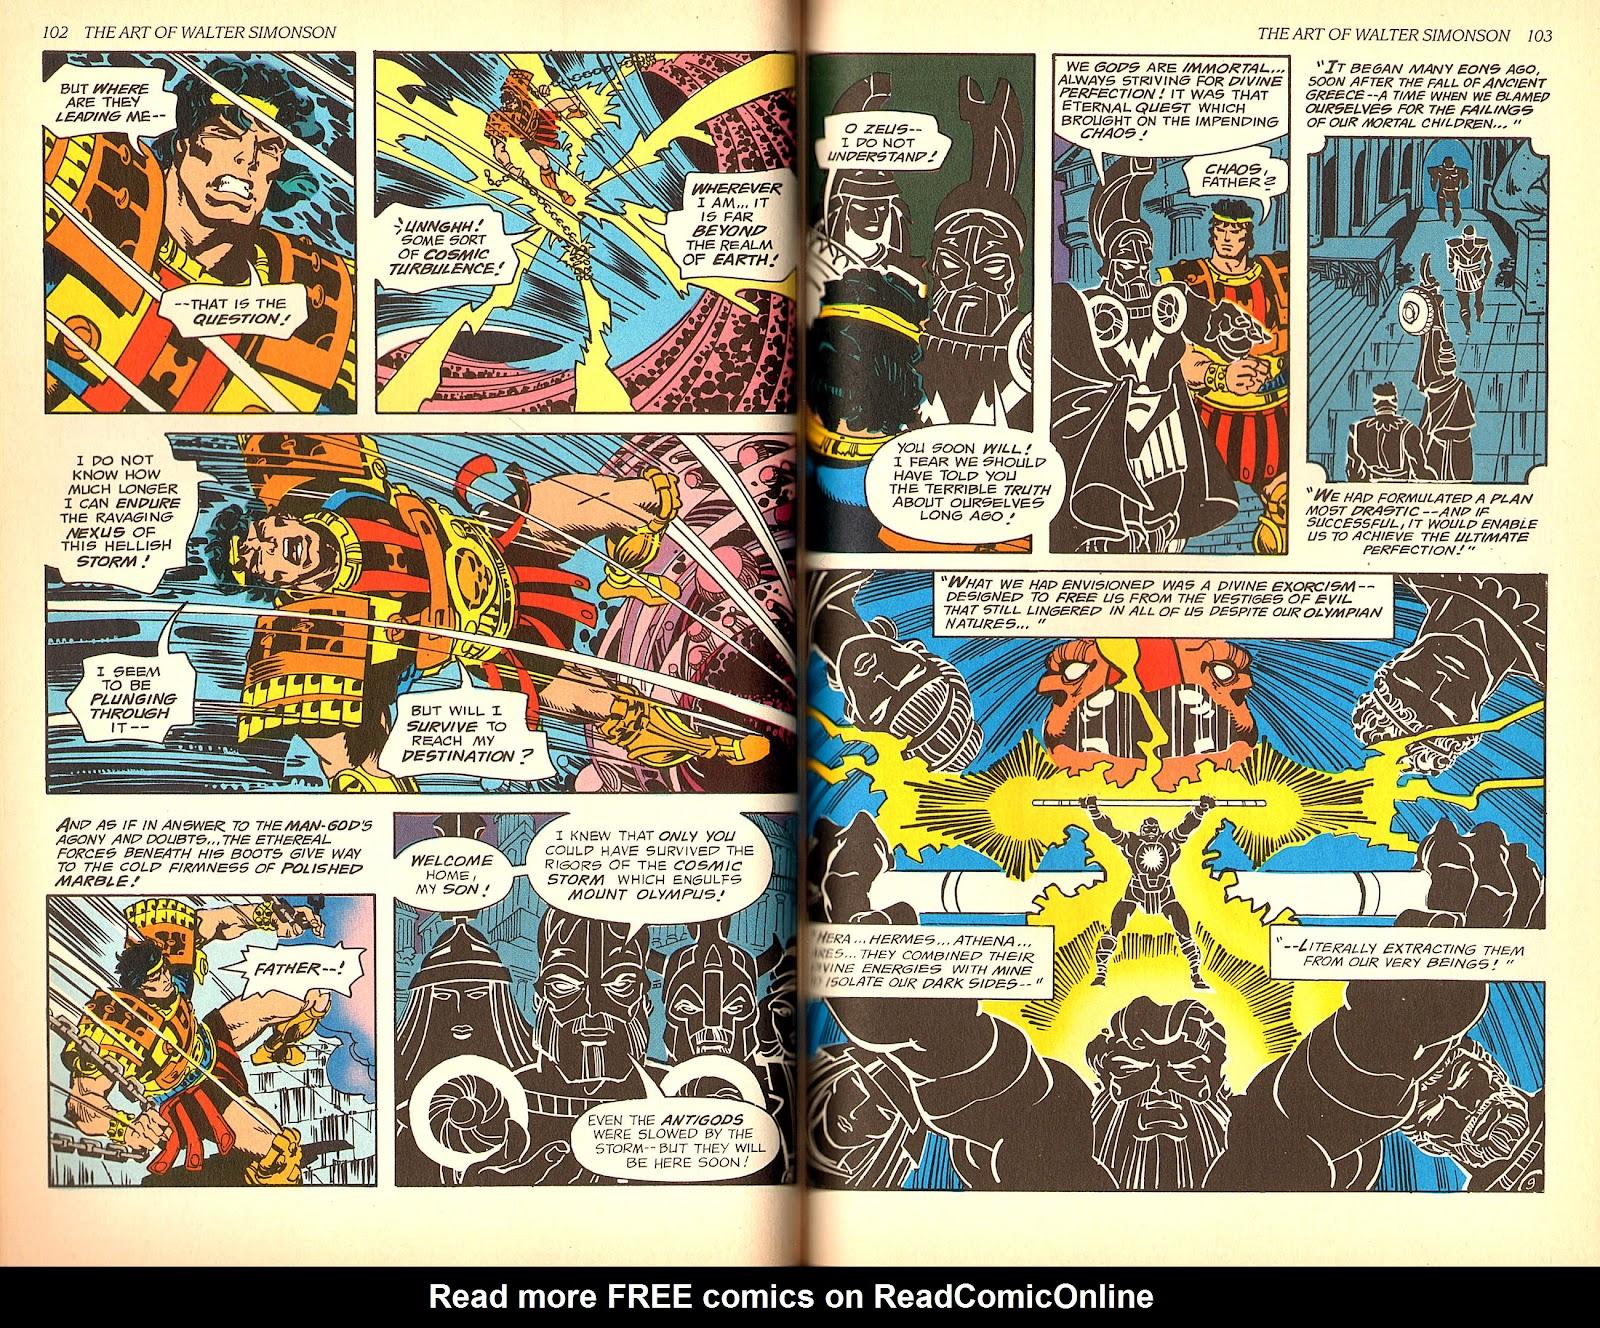 Read online The Art of Walter Simonson comic -  Issue # TPB - 53